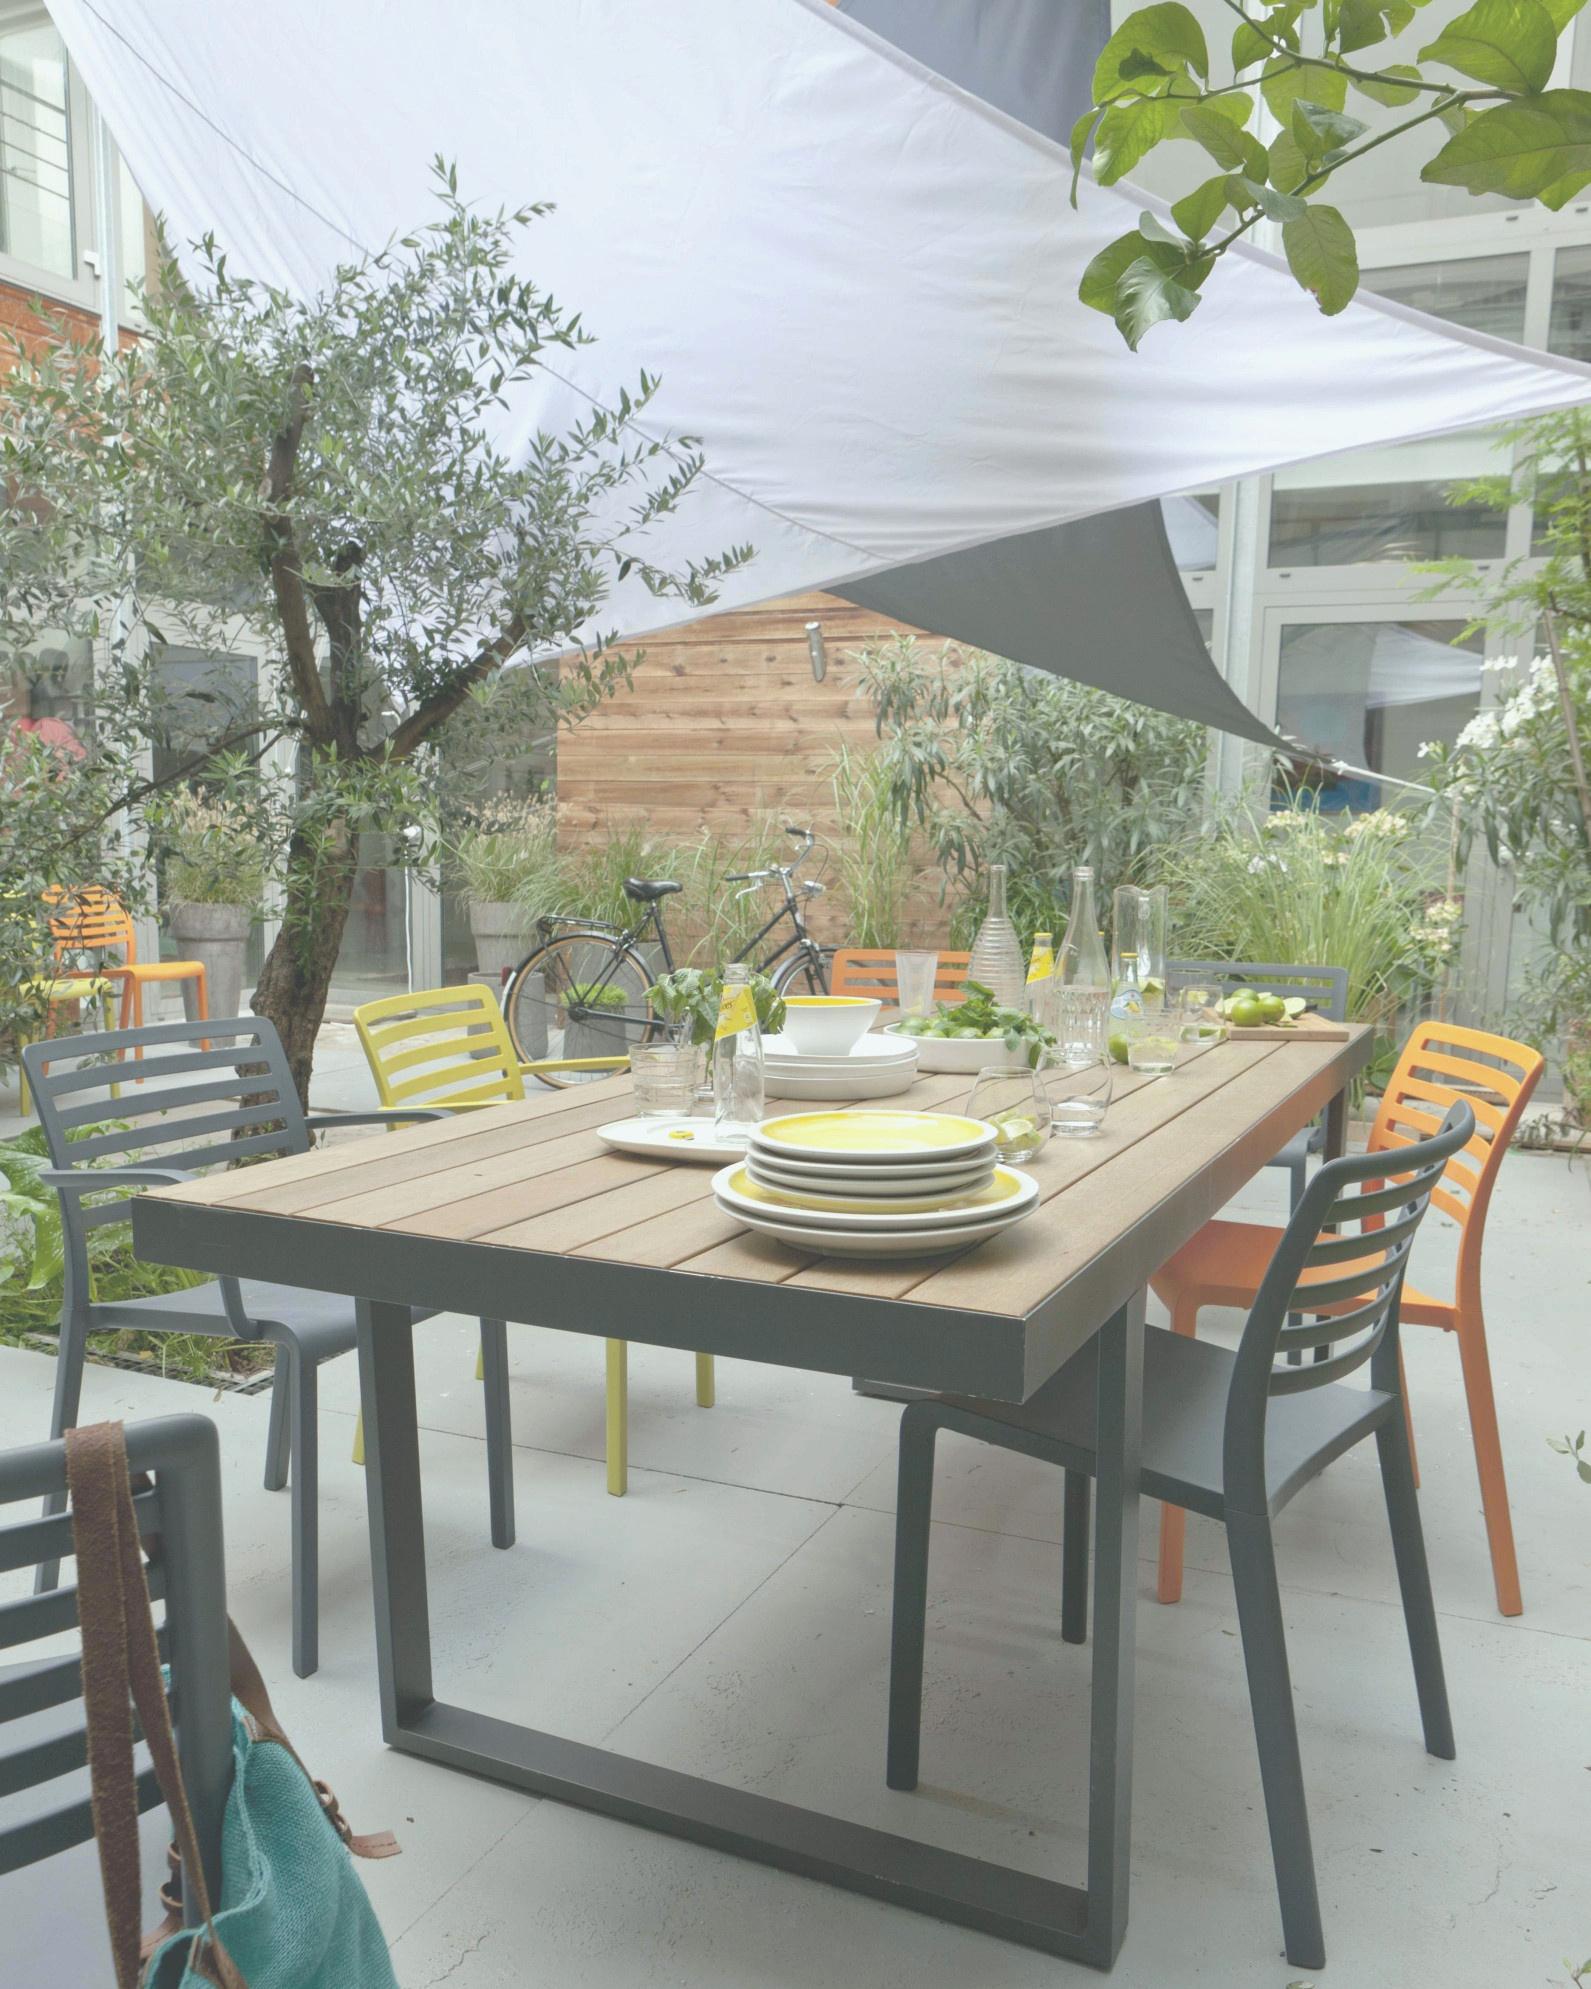 Luxe Vente Privee Chaise - Luckytroll destiné Vente Privée Jardin